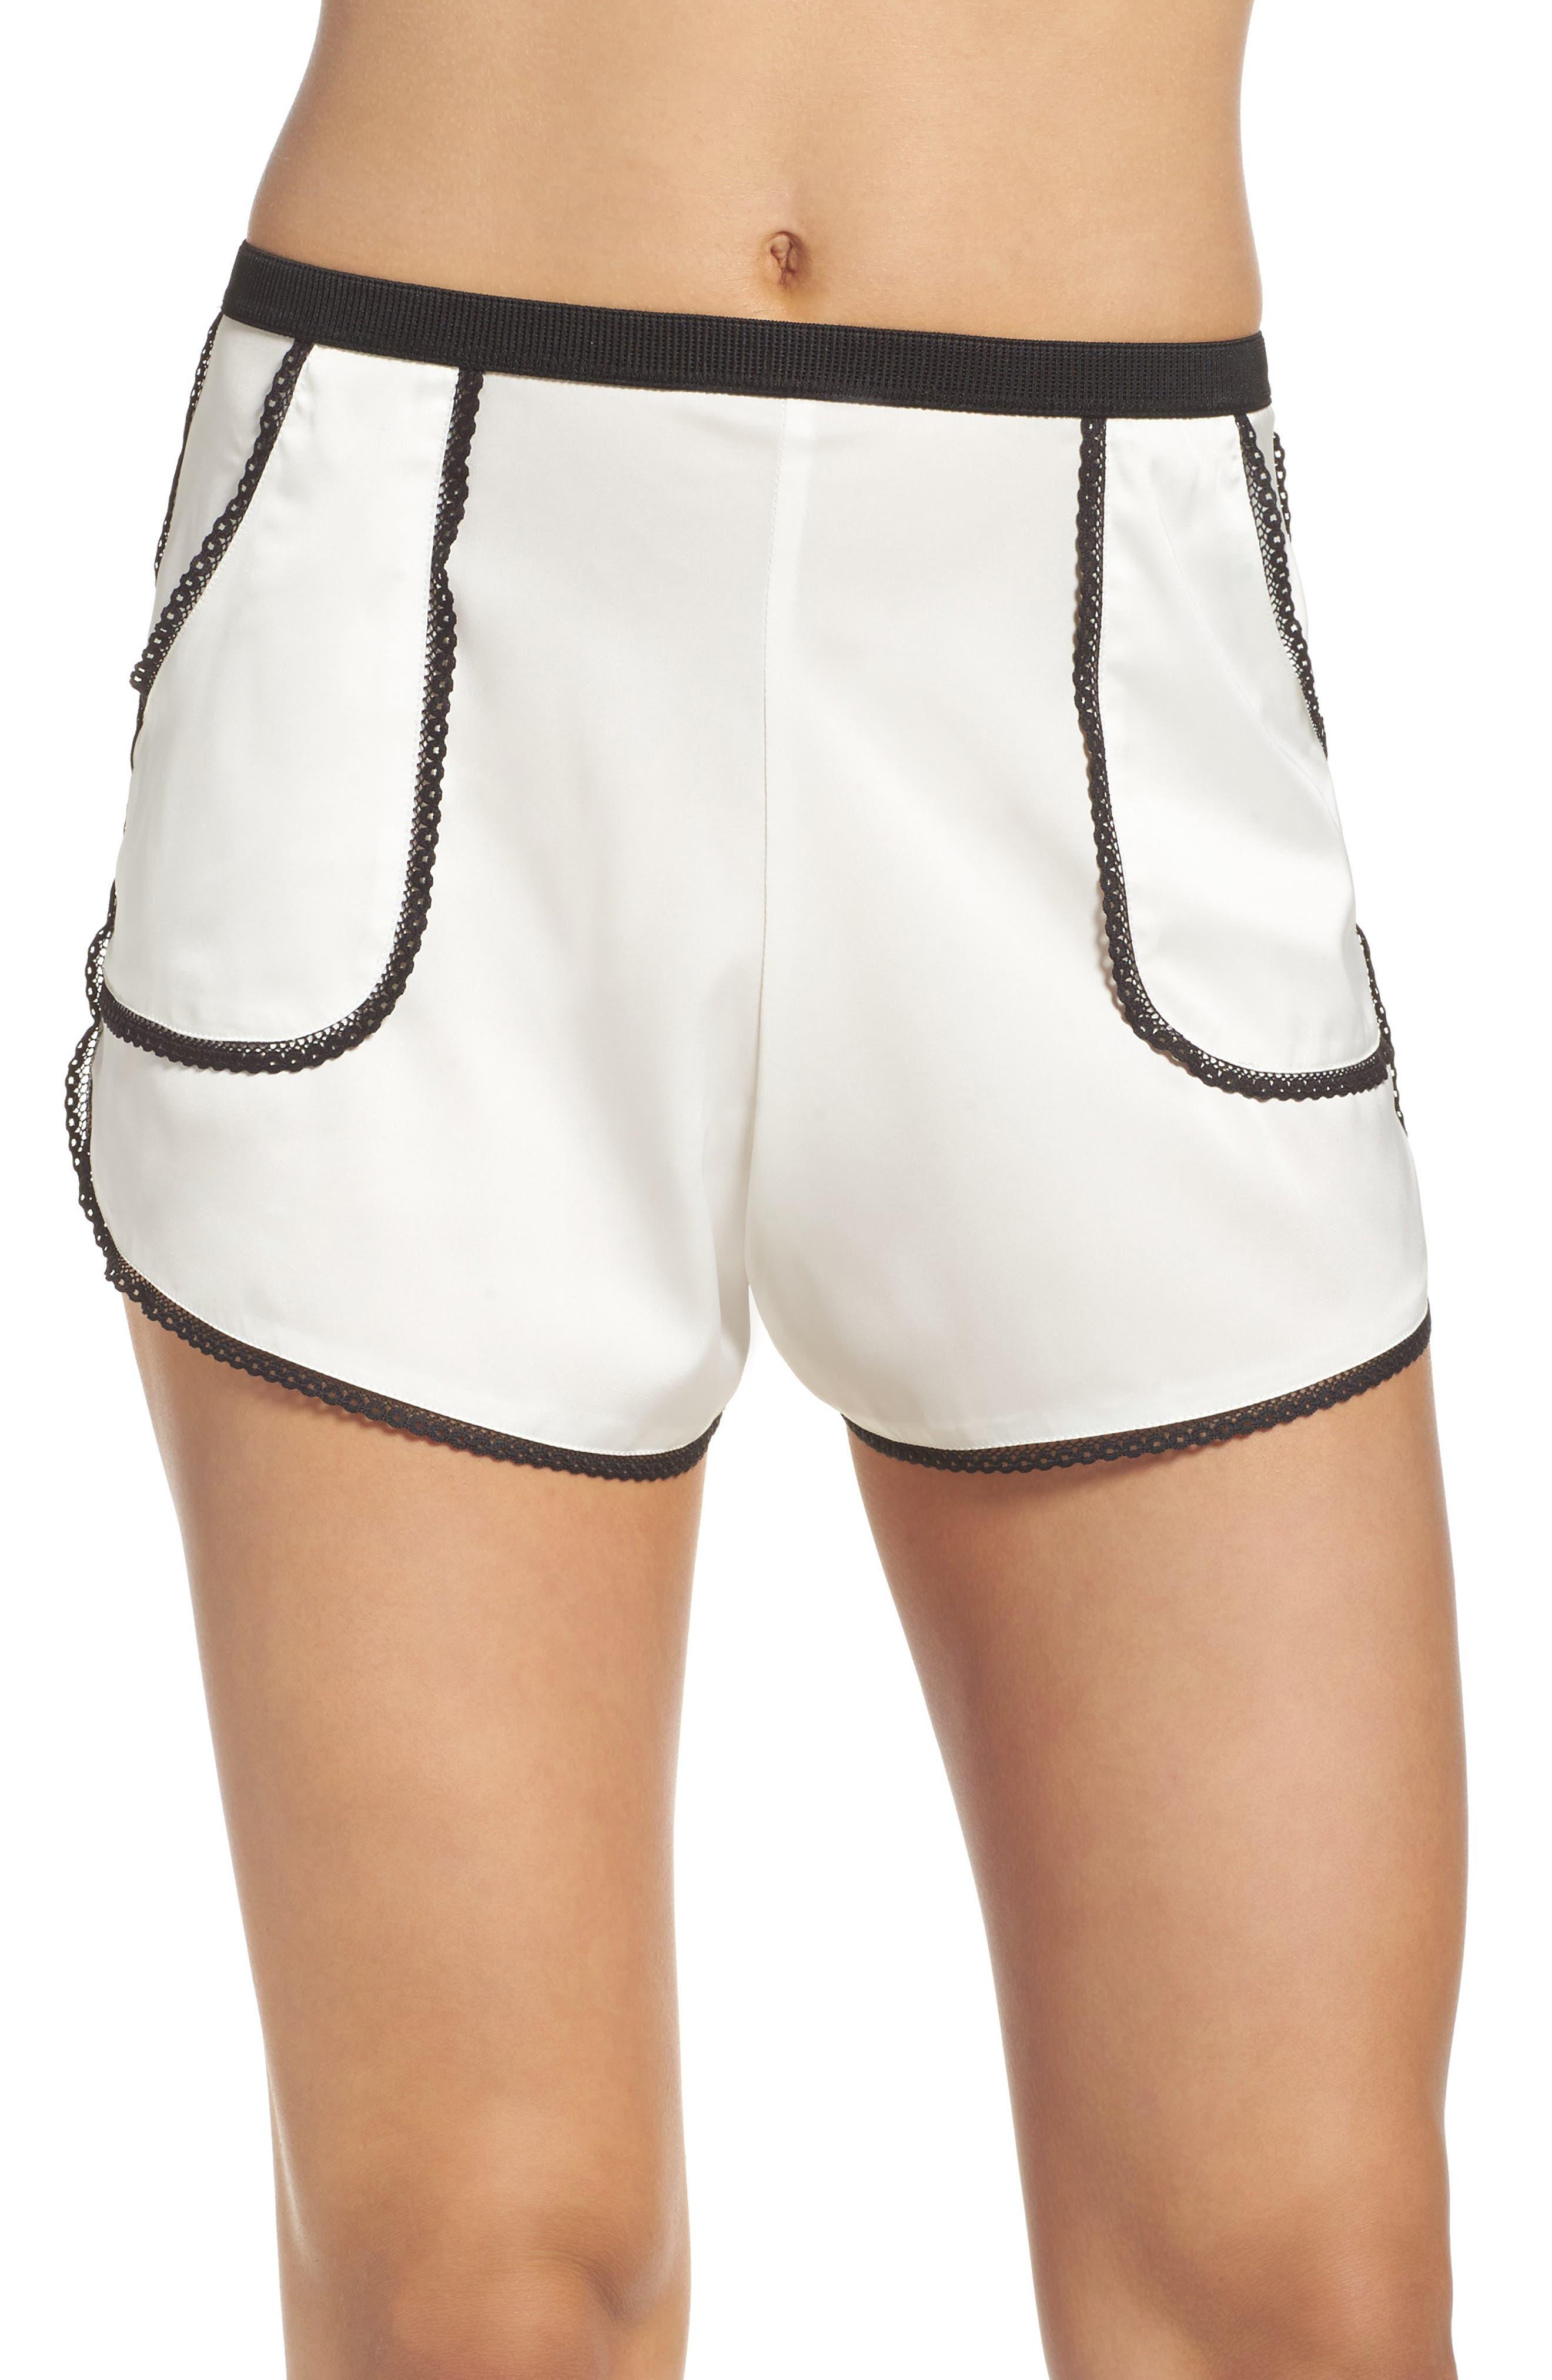 Thistle & Spire Devoe Satin Pajama Shorts,                             Main thumbnail 1, color,                             900